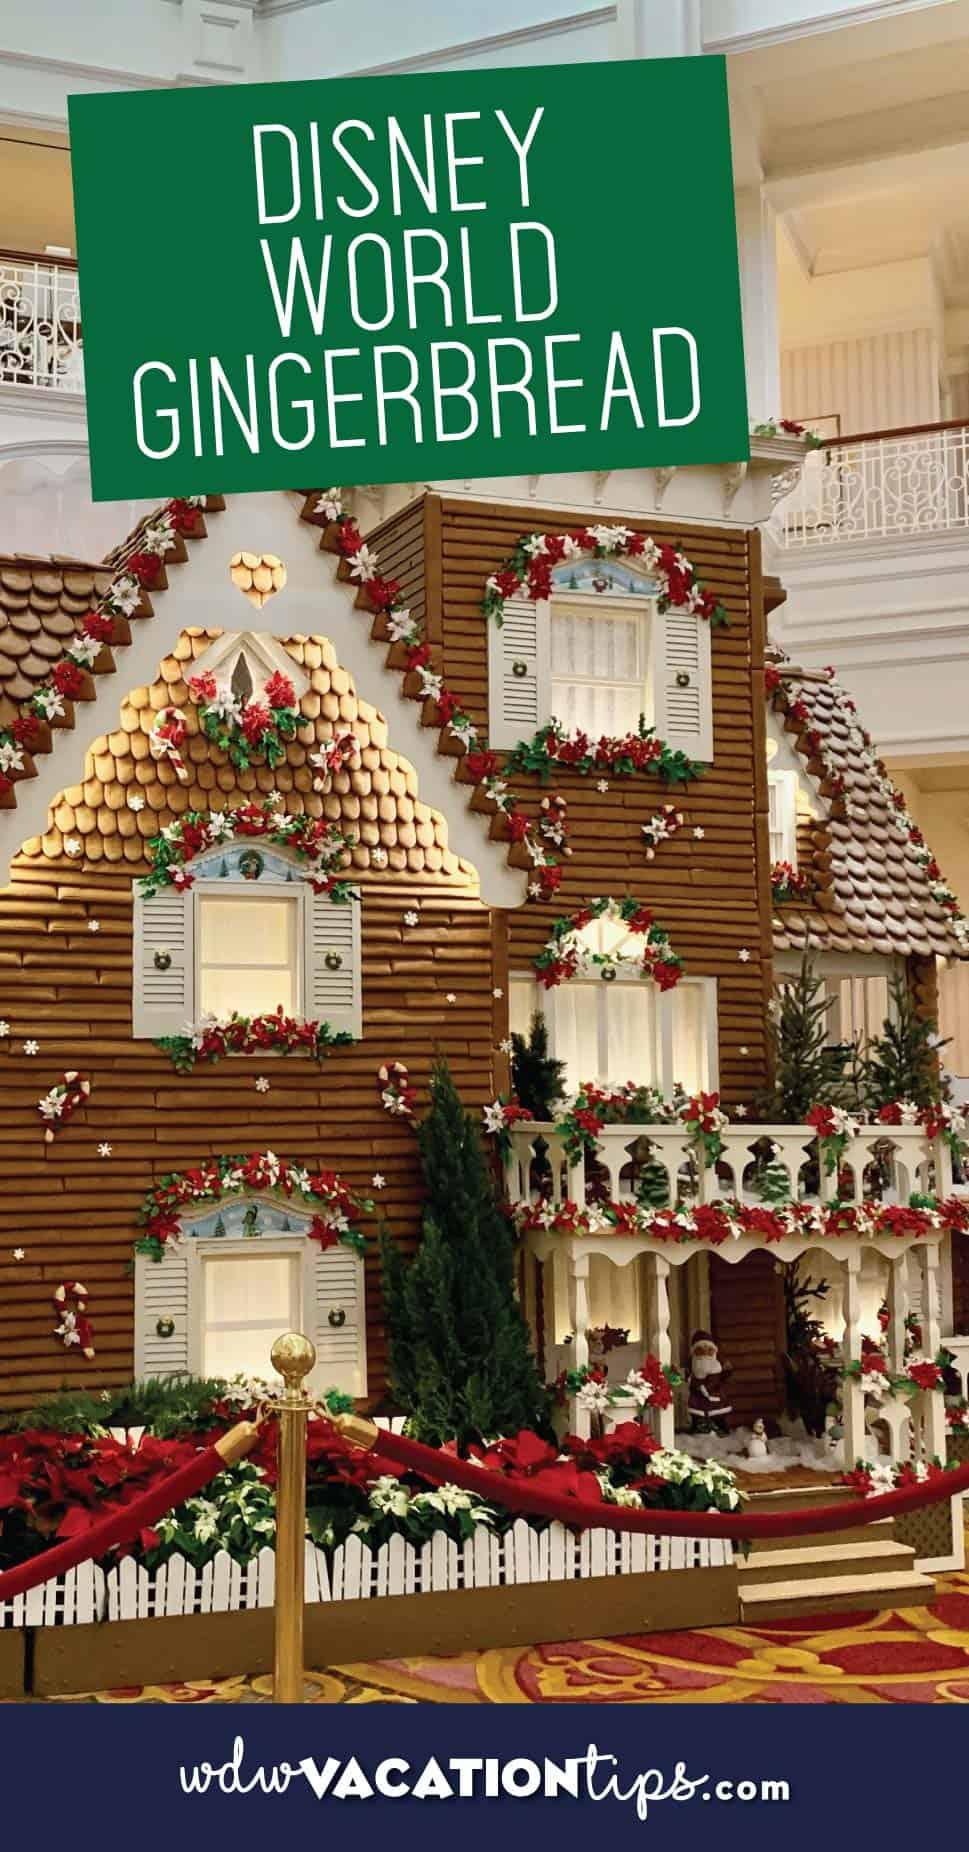 Disney World Gingerbread displays